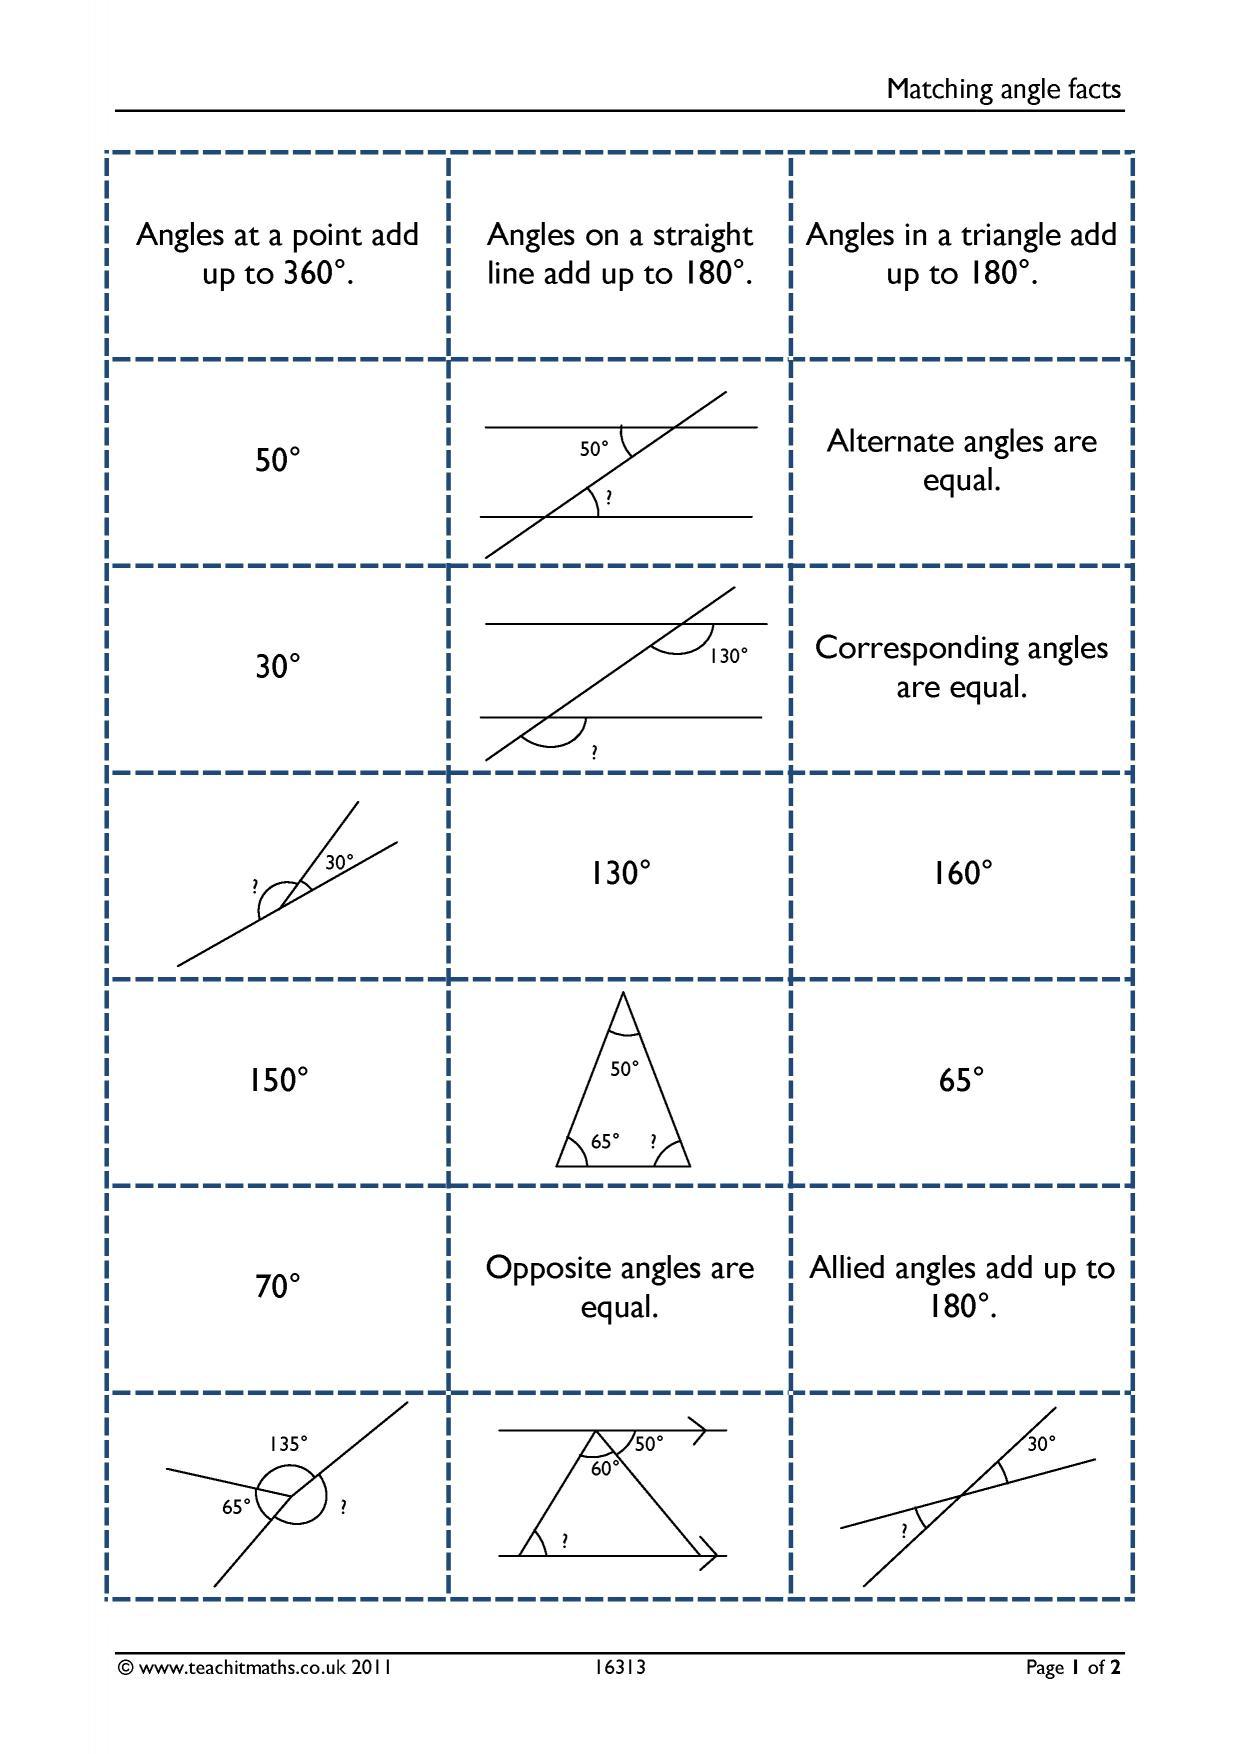 Matching Angle Facts